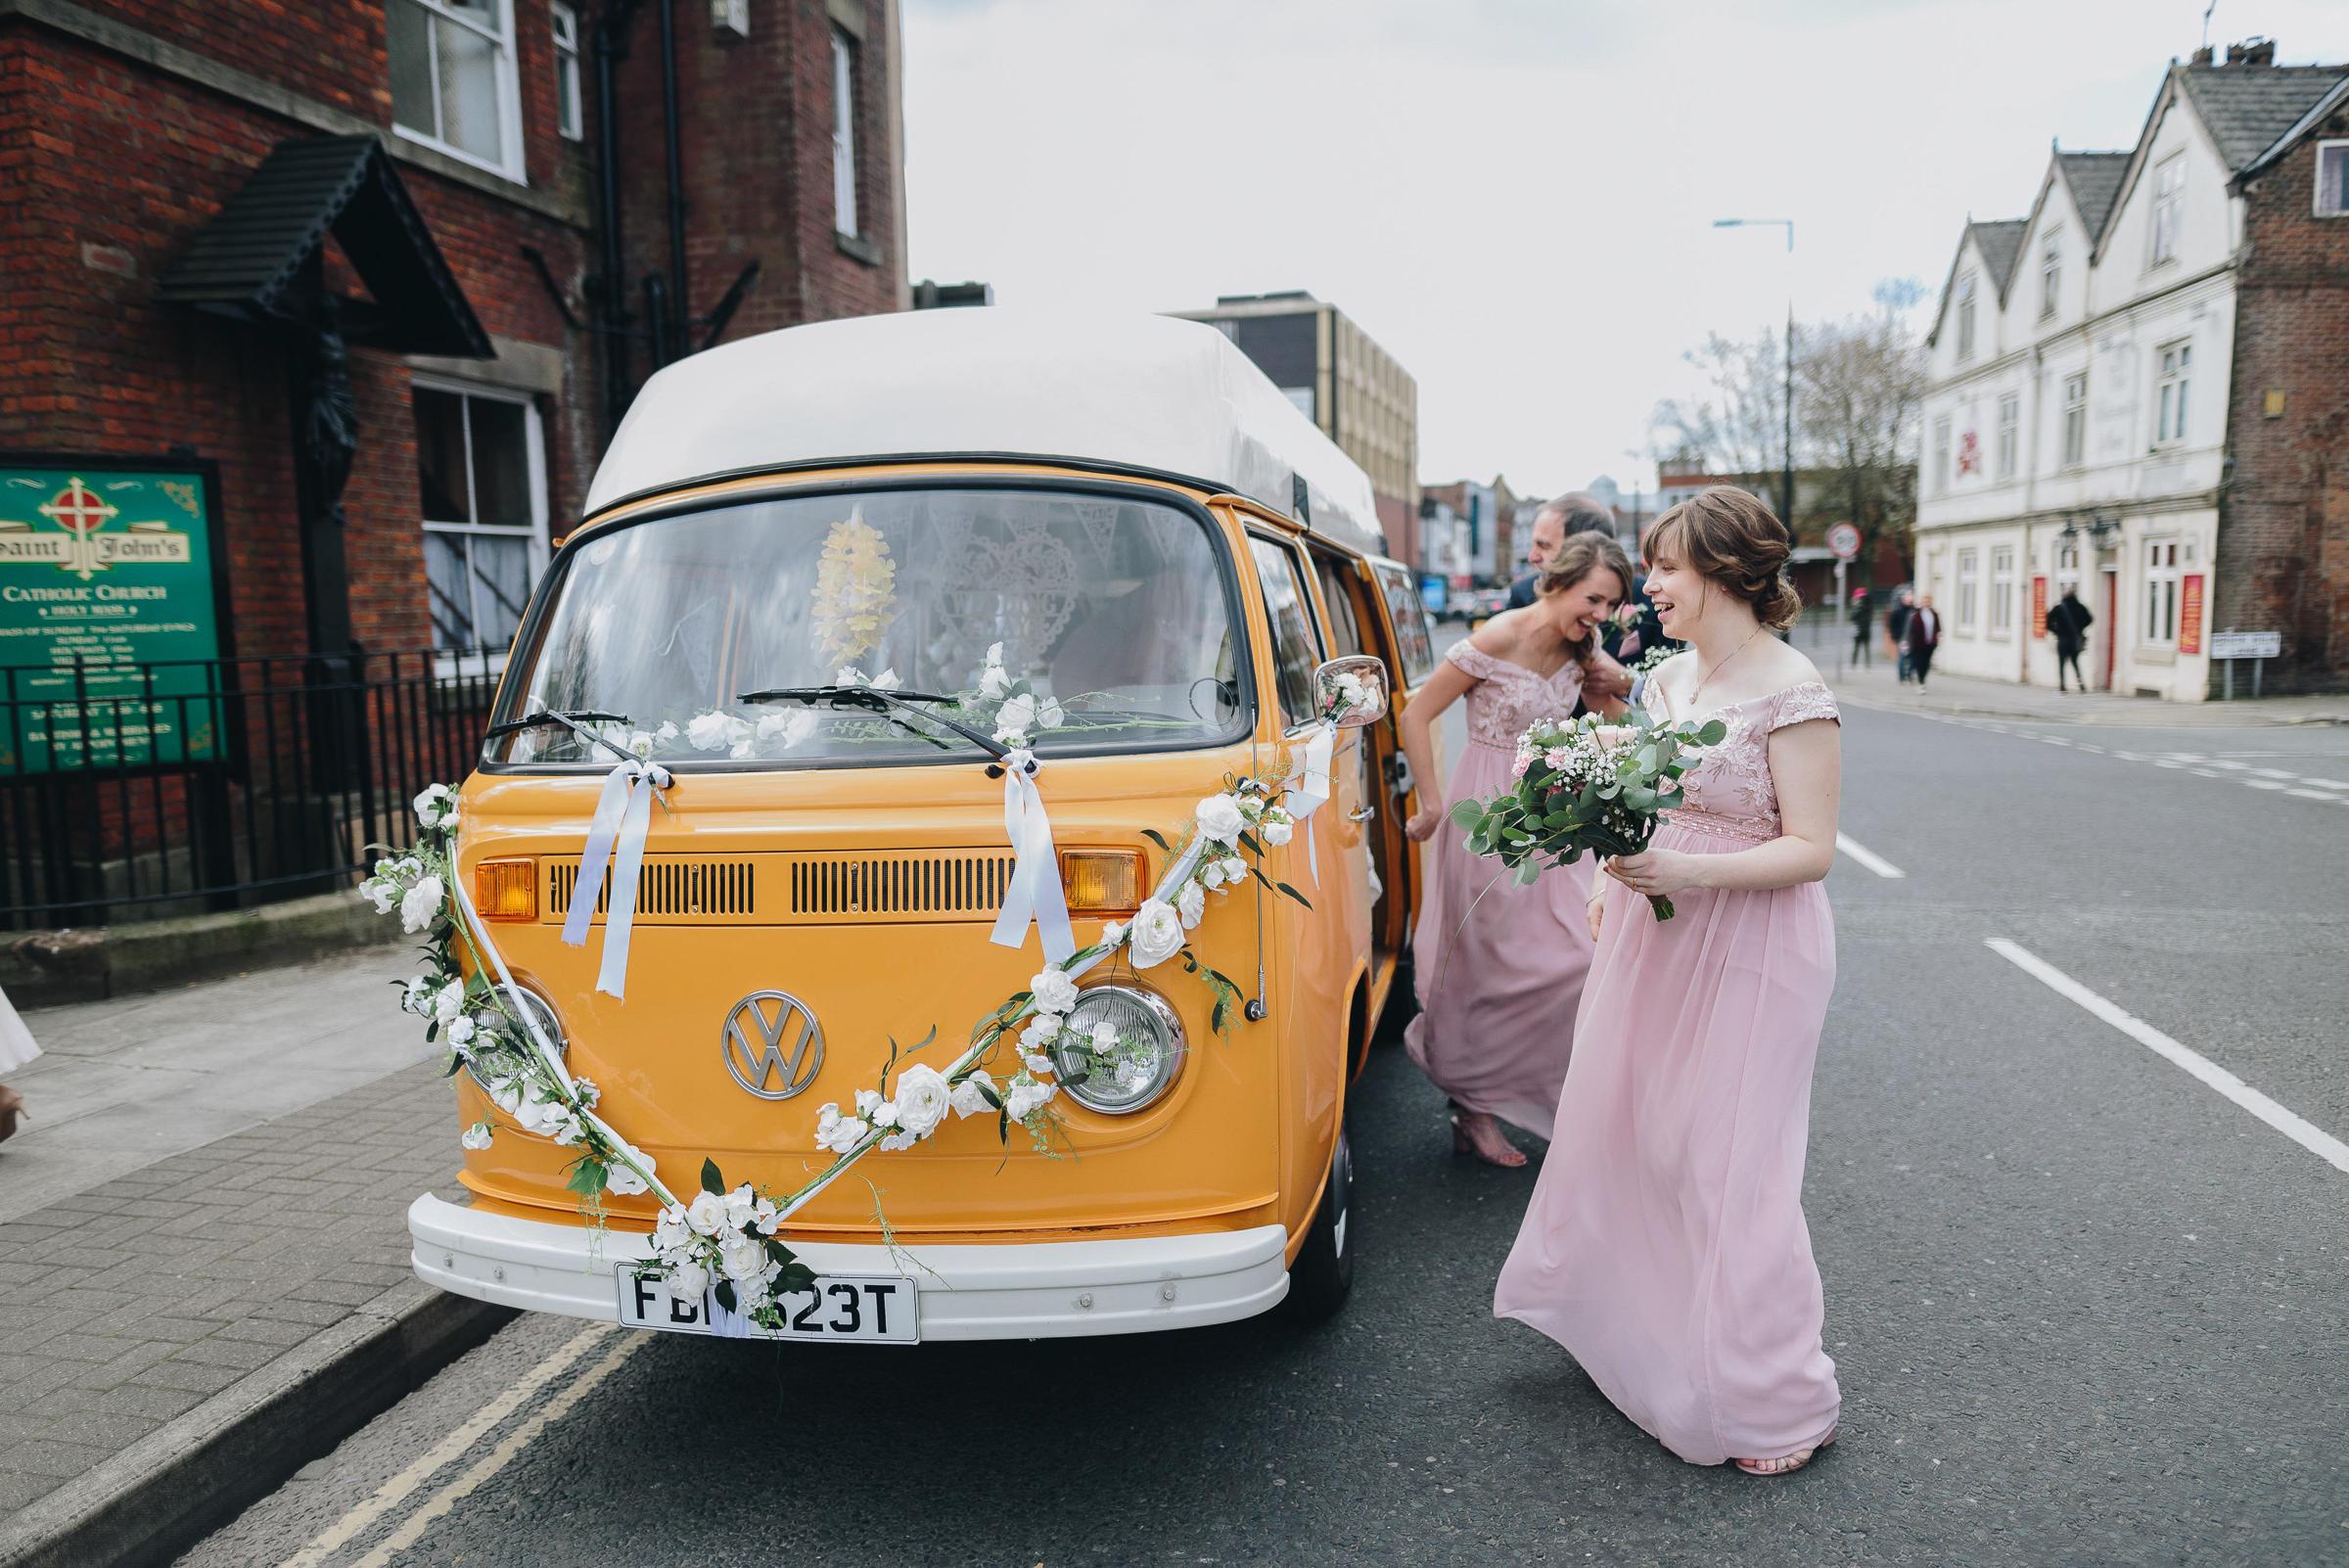 Rochdale-town-hall-vegan-harry-potter-wedding-photography-11.jpg